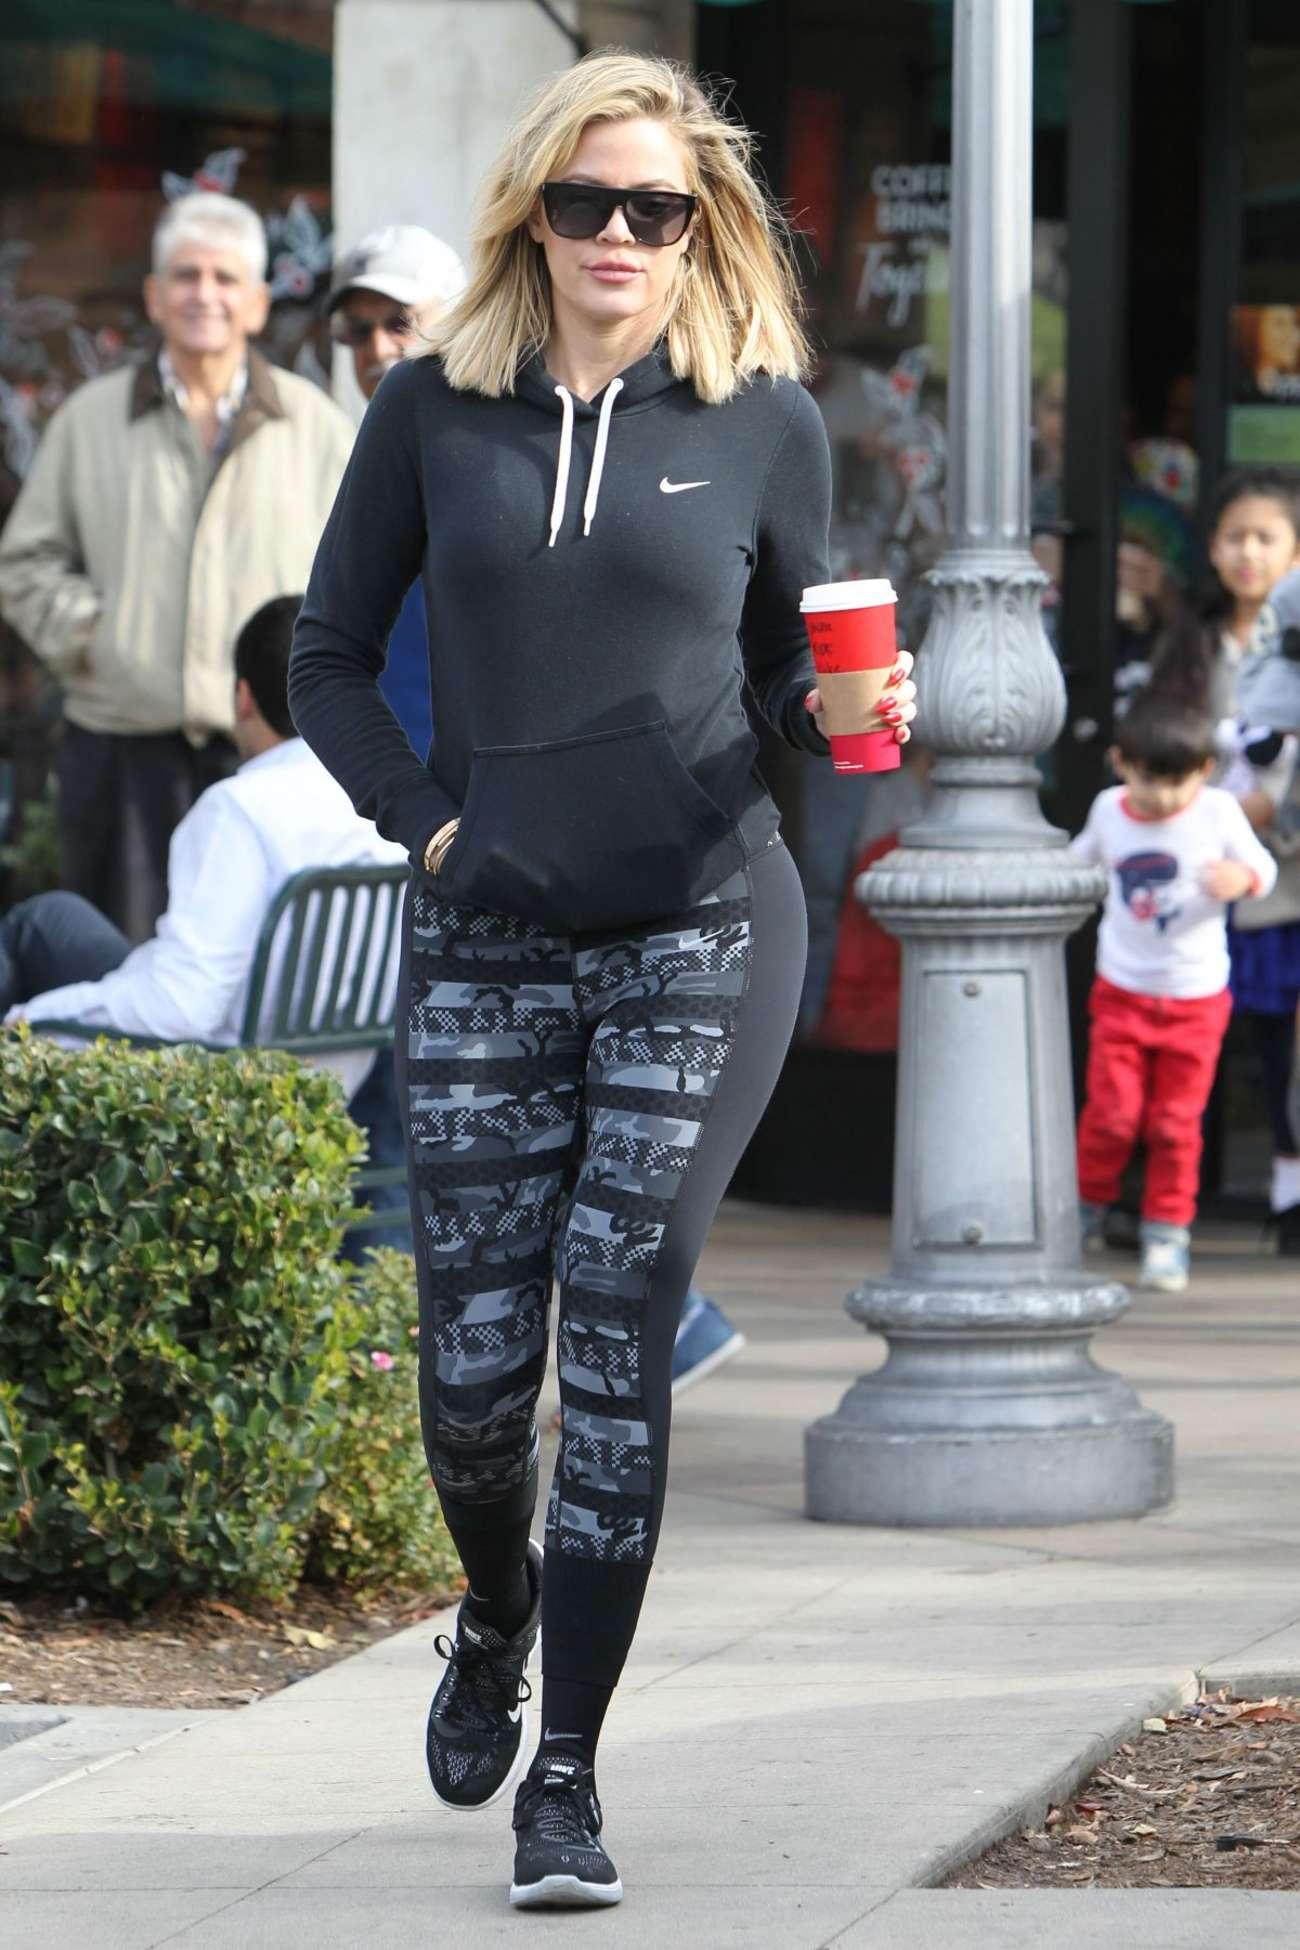 Khloe Kardashian At Starbucks For A Coffee In Calabasas